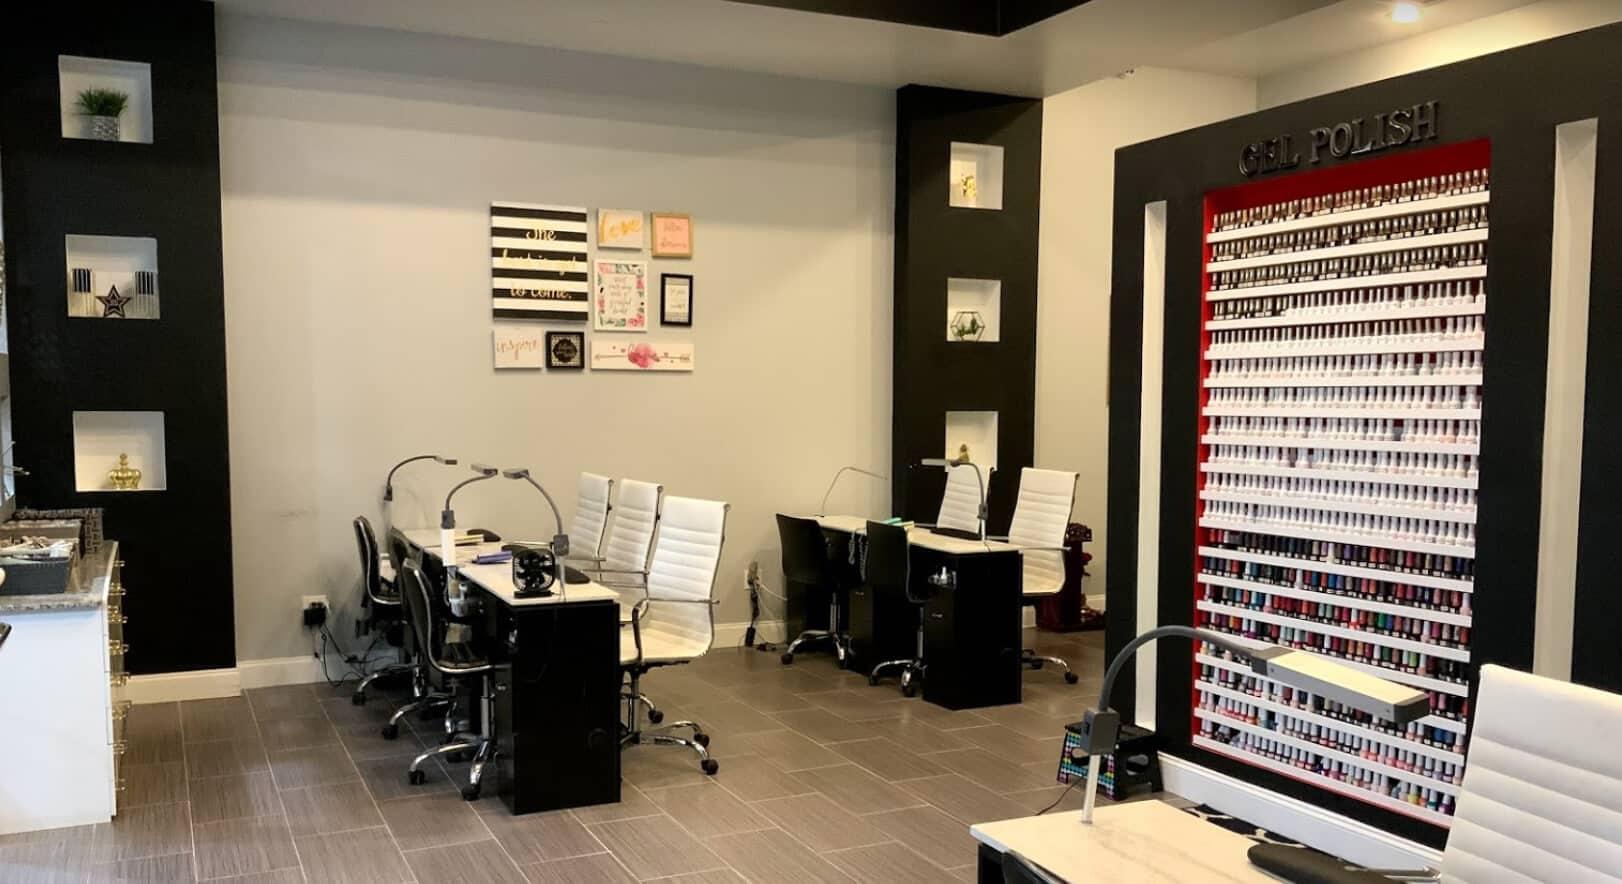 Cần tuyển thợ nail xuyên bang tại Lake Charles, LA-70605